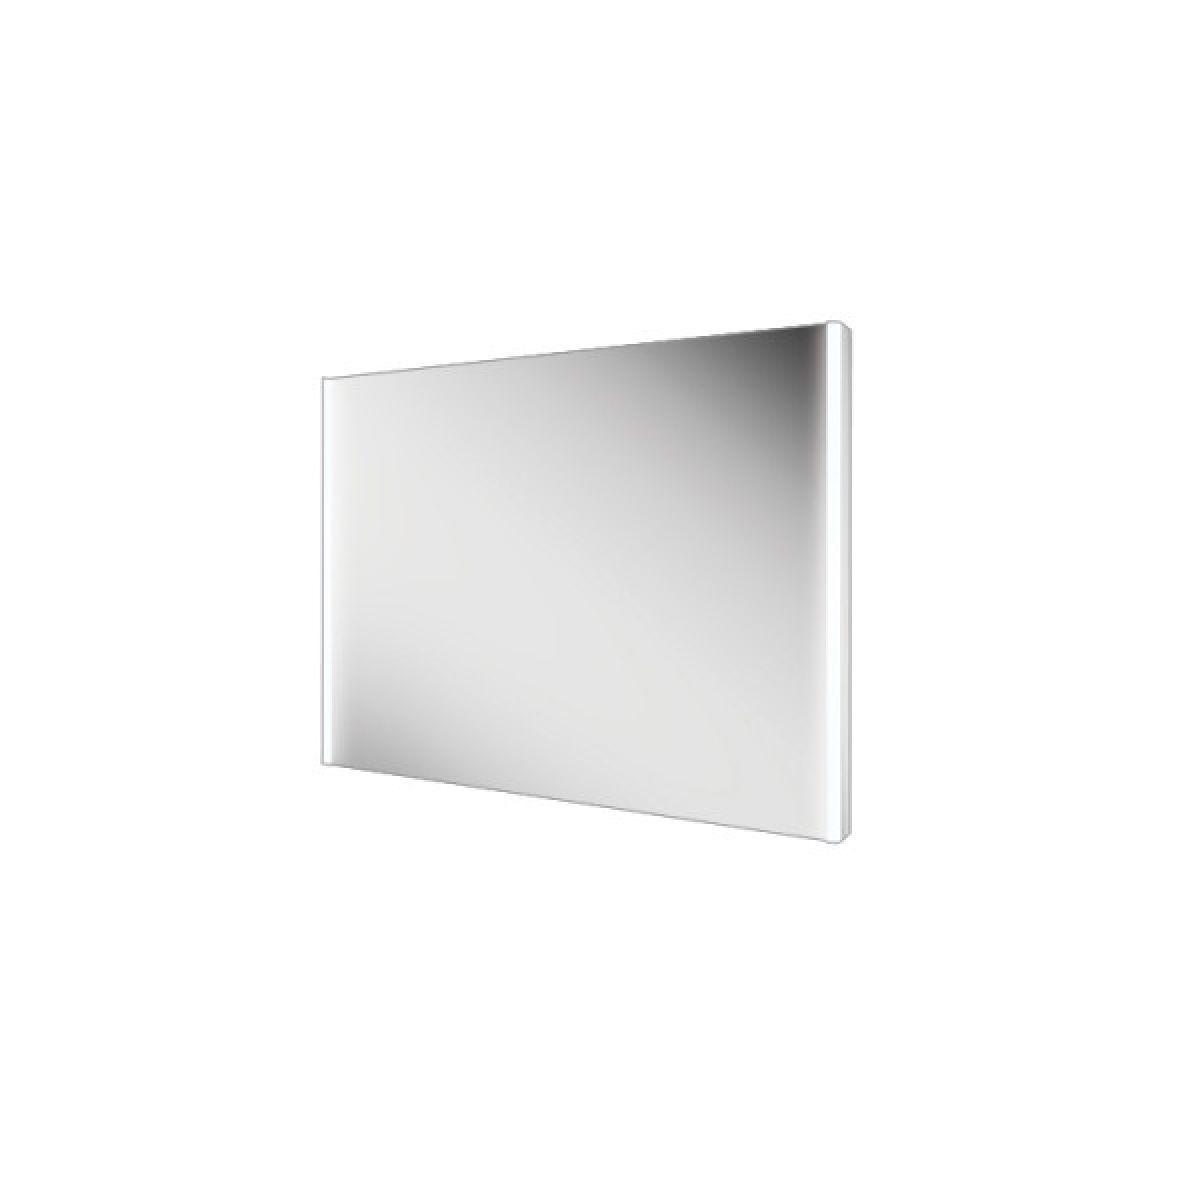 HiB Zircon 80 LED Steam Free Bathroom Mirror